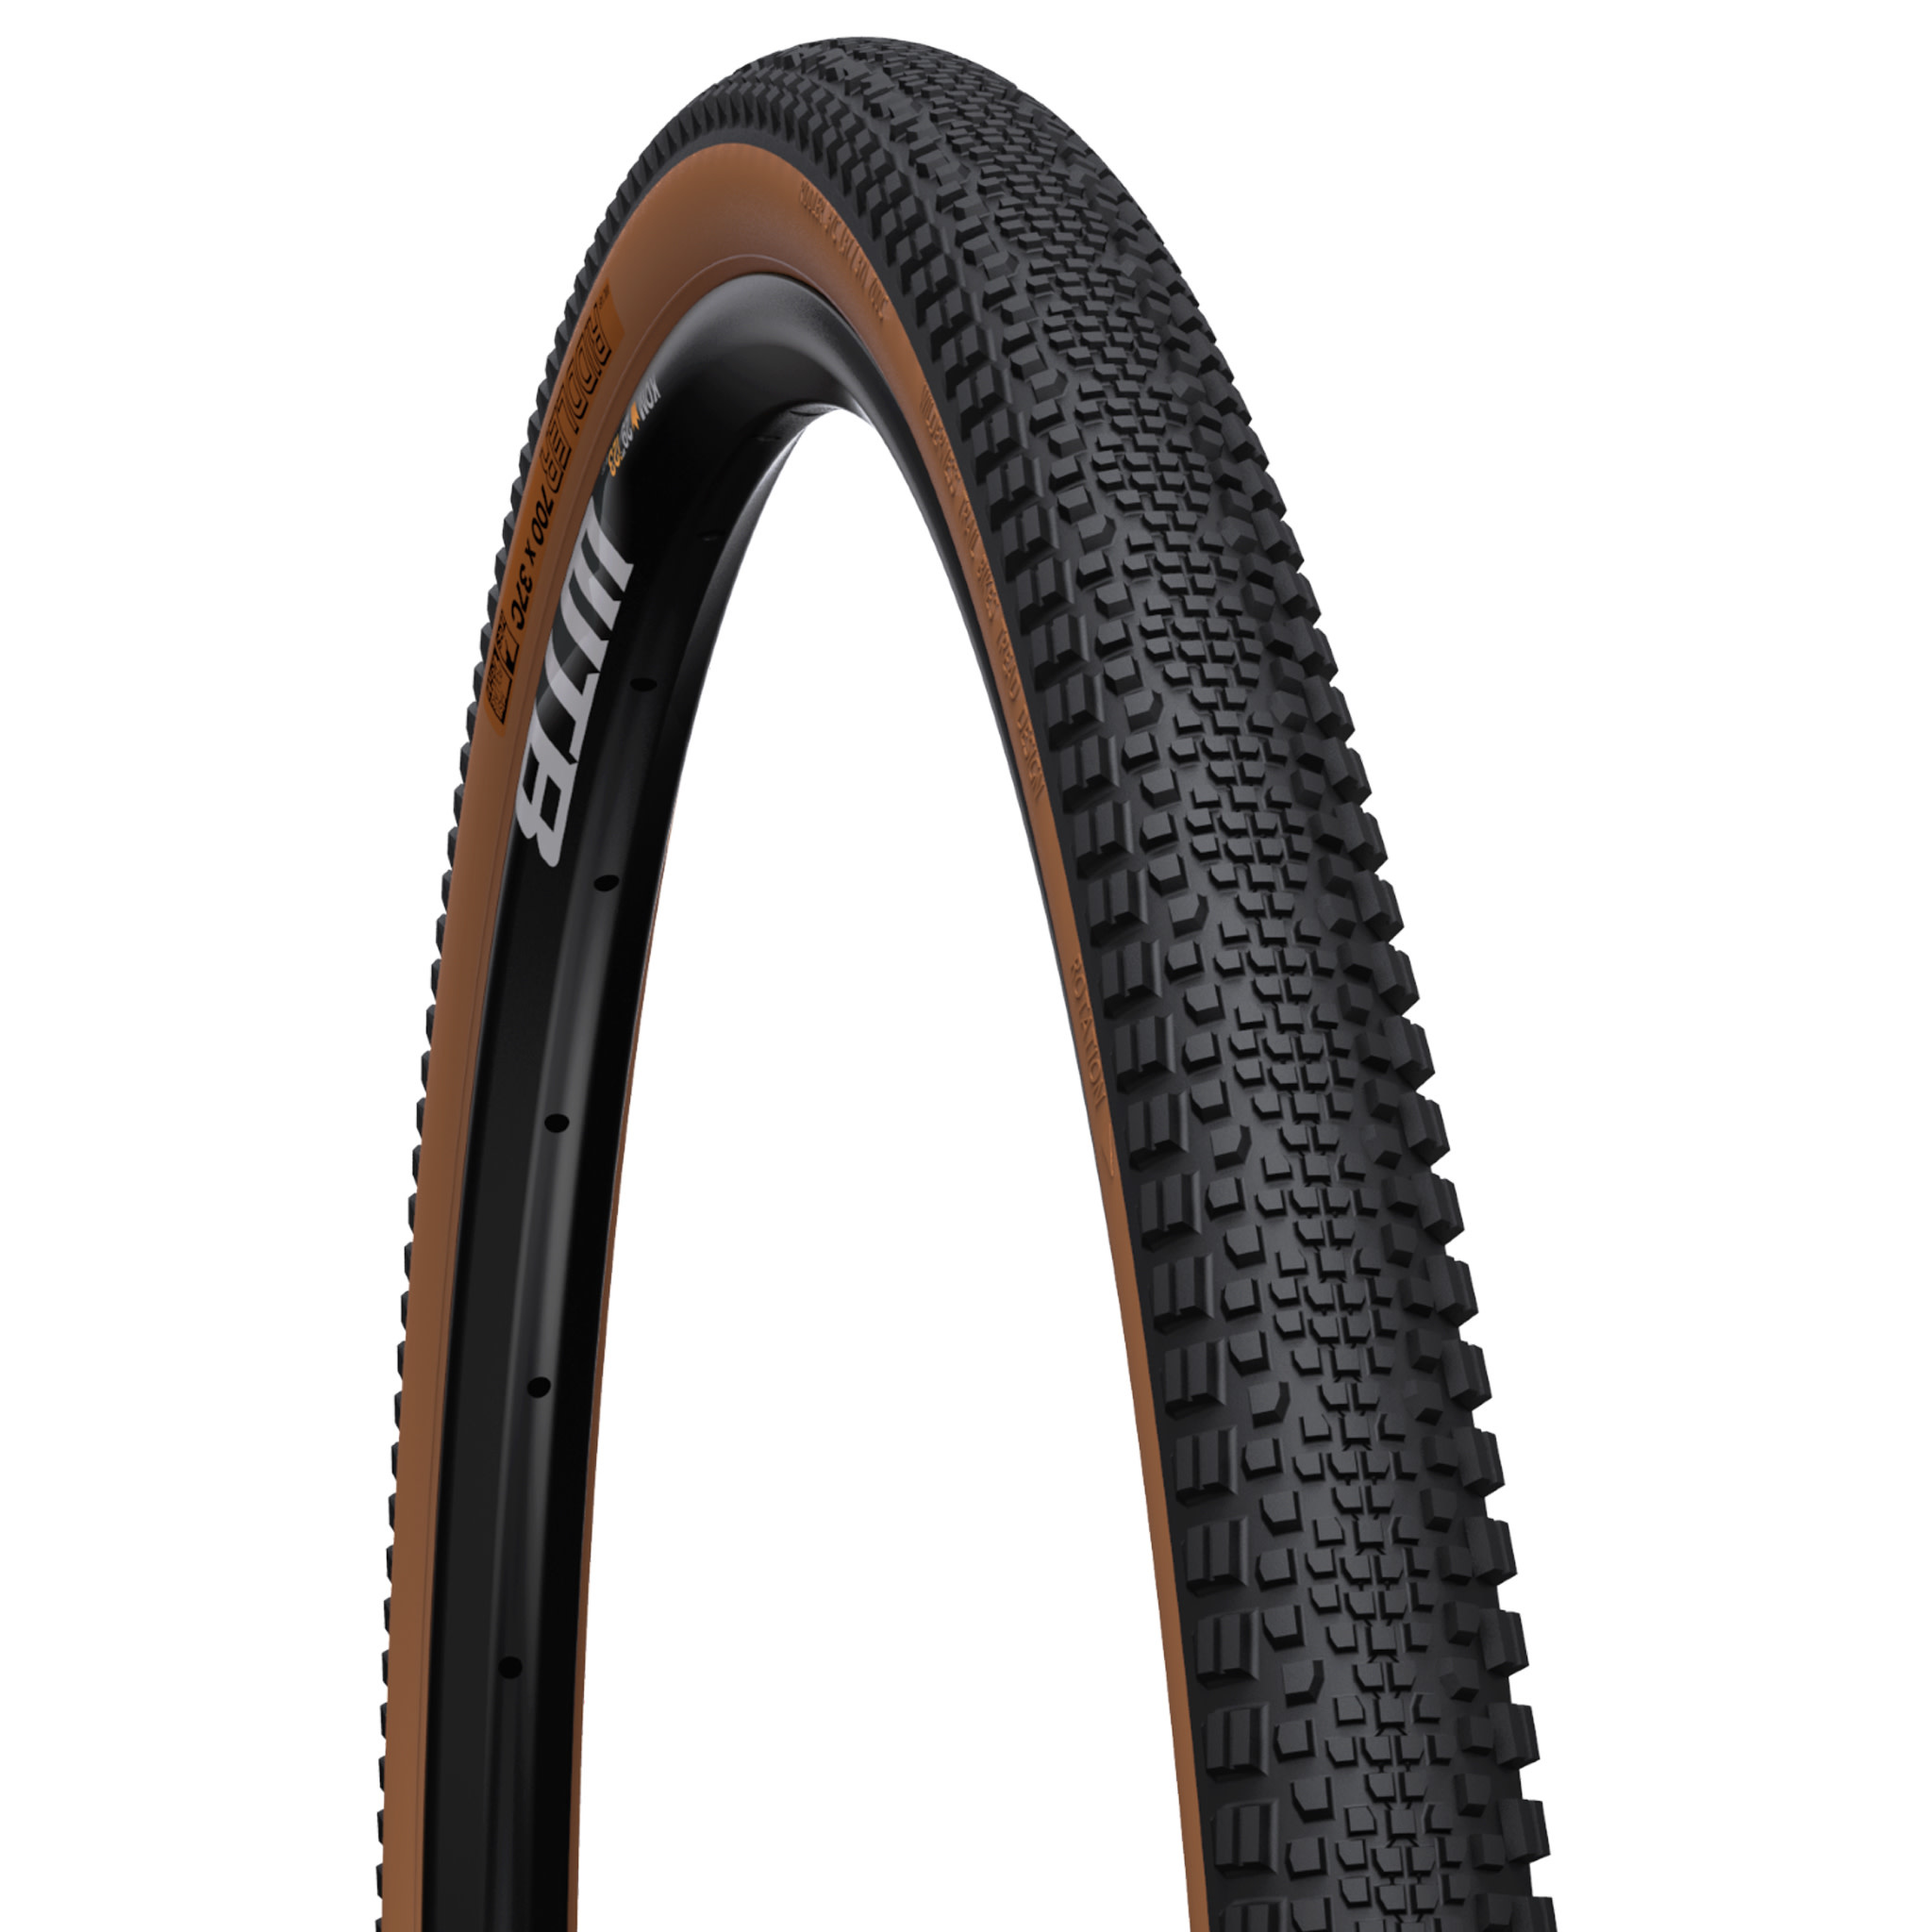 WTB WTB, Riddler, Tire, 700x37C, Folding, Tubeless Ready, Dual DNA, 60TPI, Beige